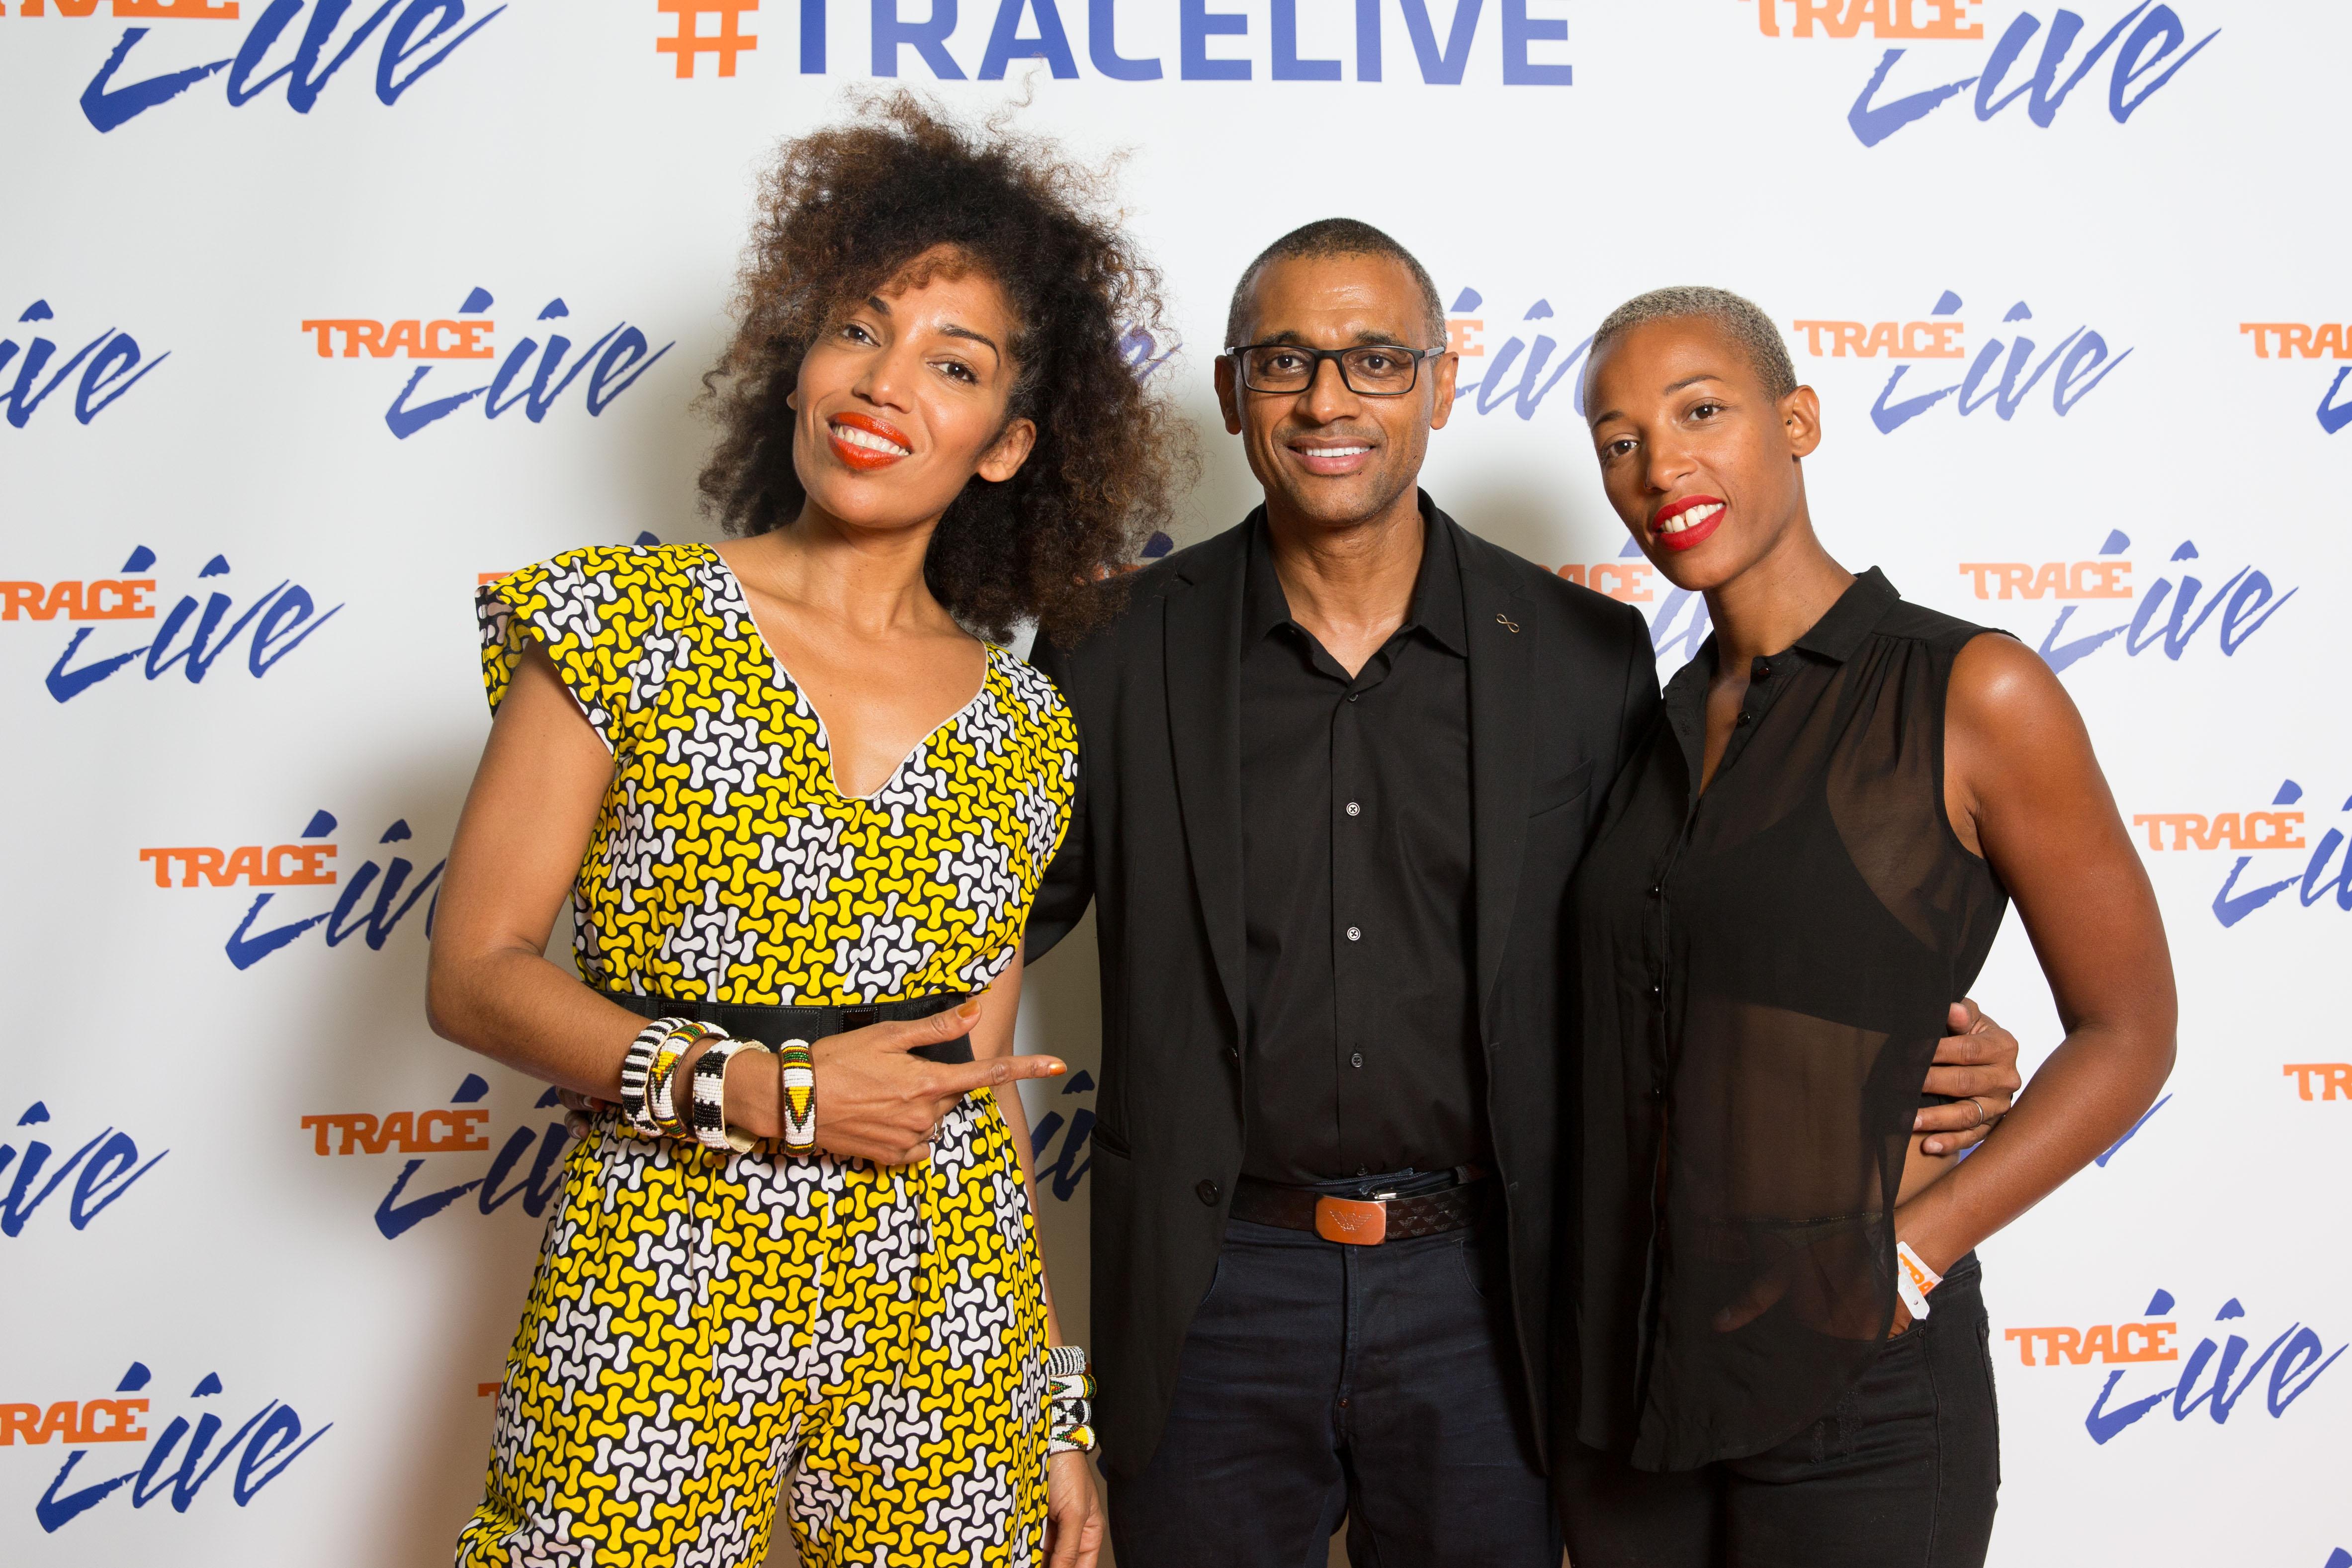 Ayden, Olivier Laouchez et Myriam Maxo _Wyclef_Jean_TRACE_LIVE_13_06_2017 © Memorable Event